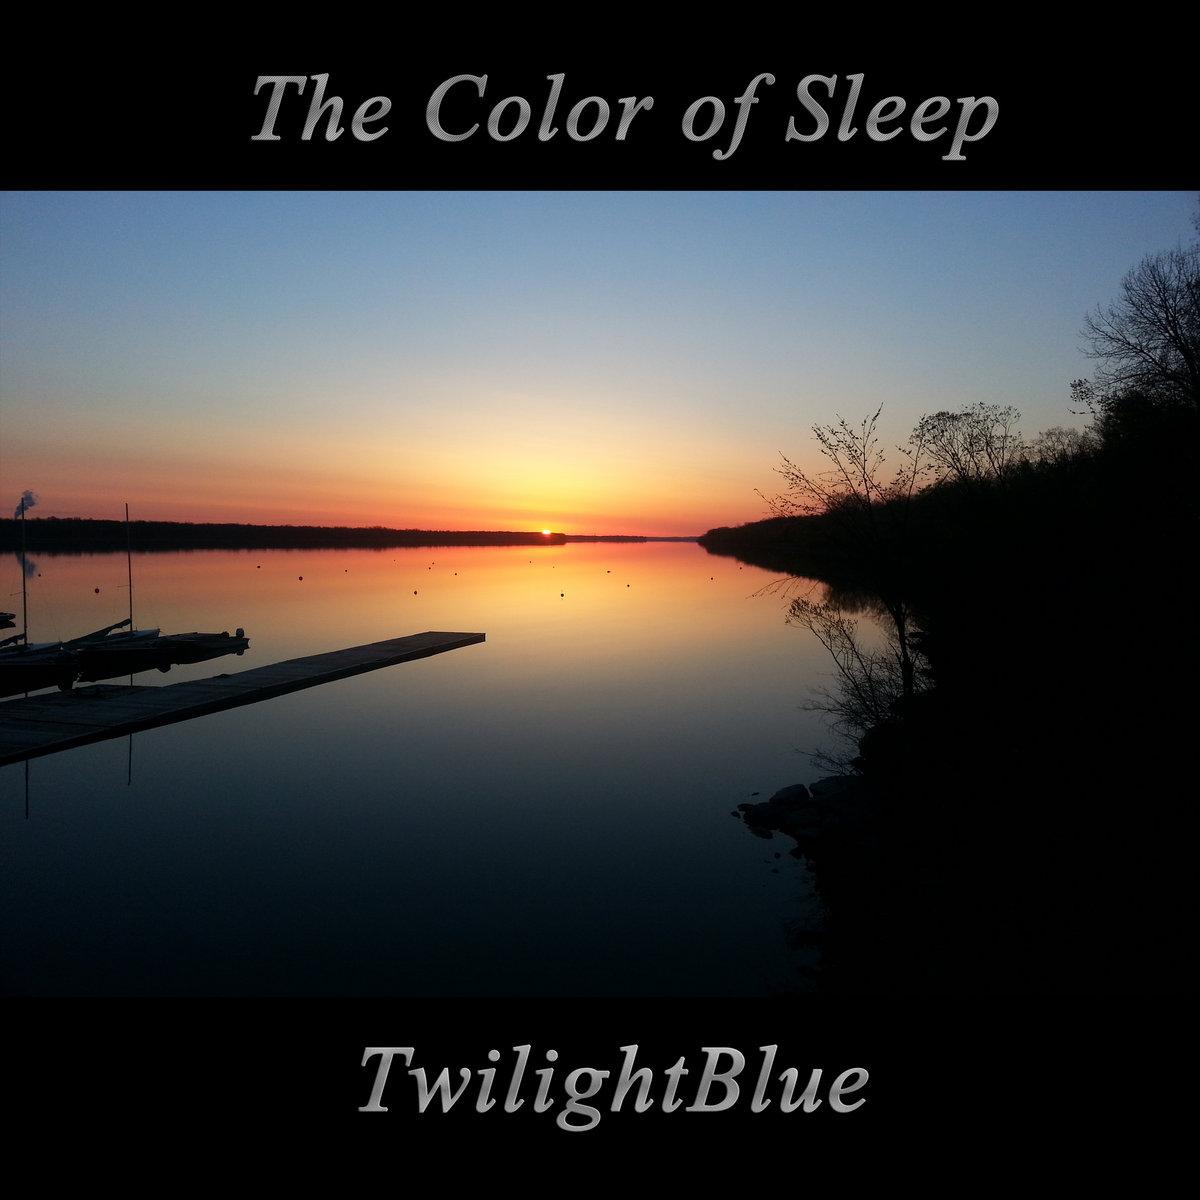 https://thecolorofsleep.bandcamp.com/album/twilightblue